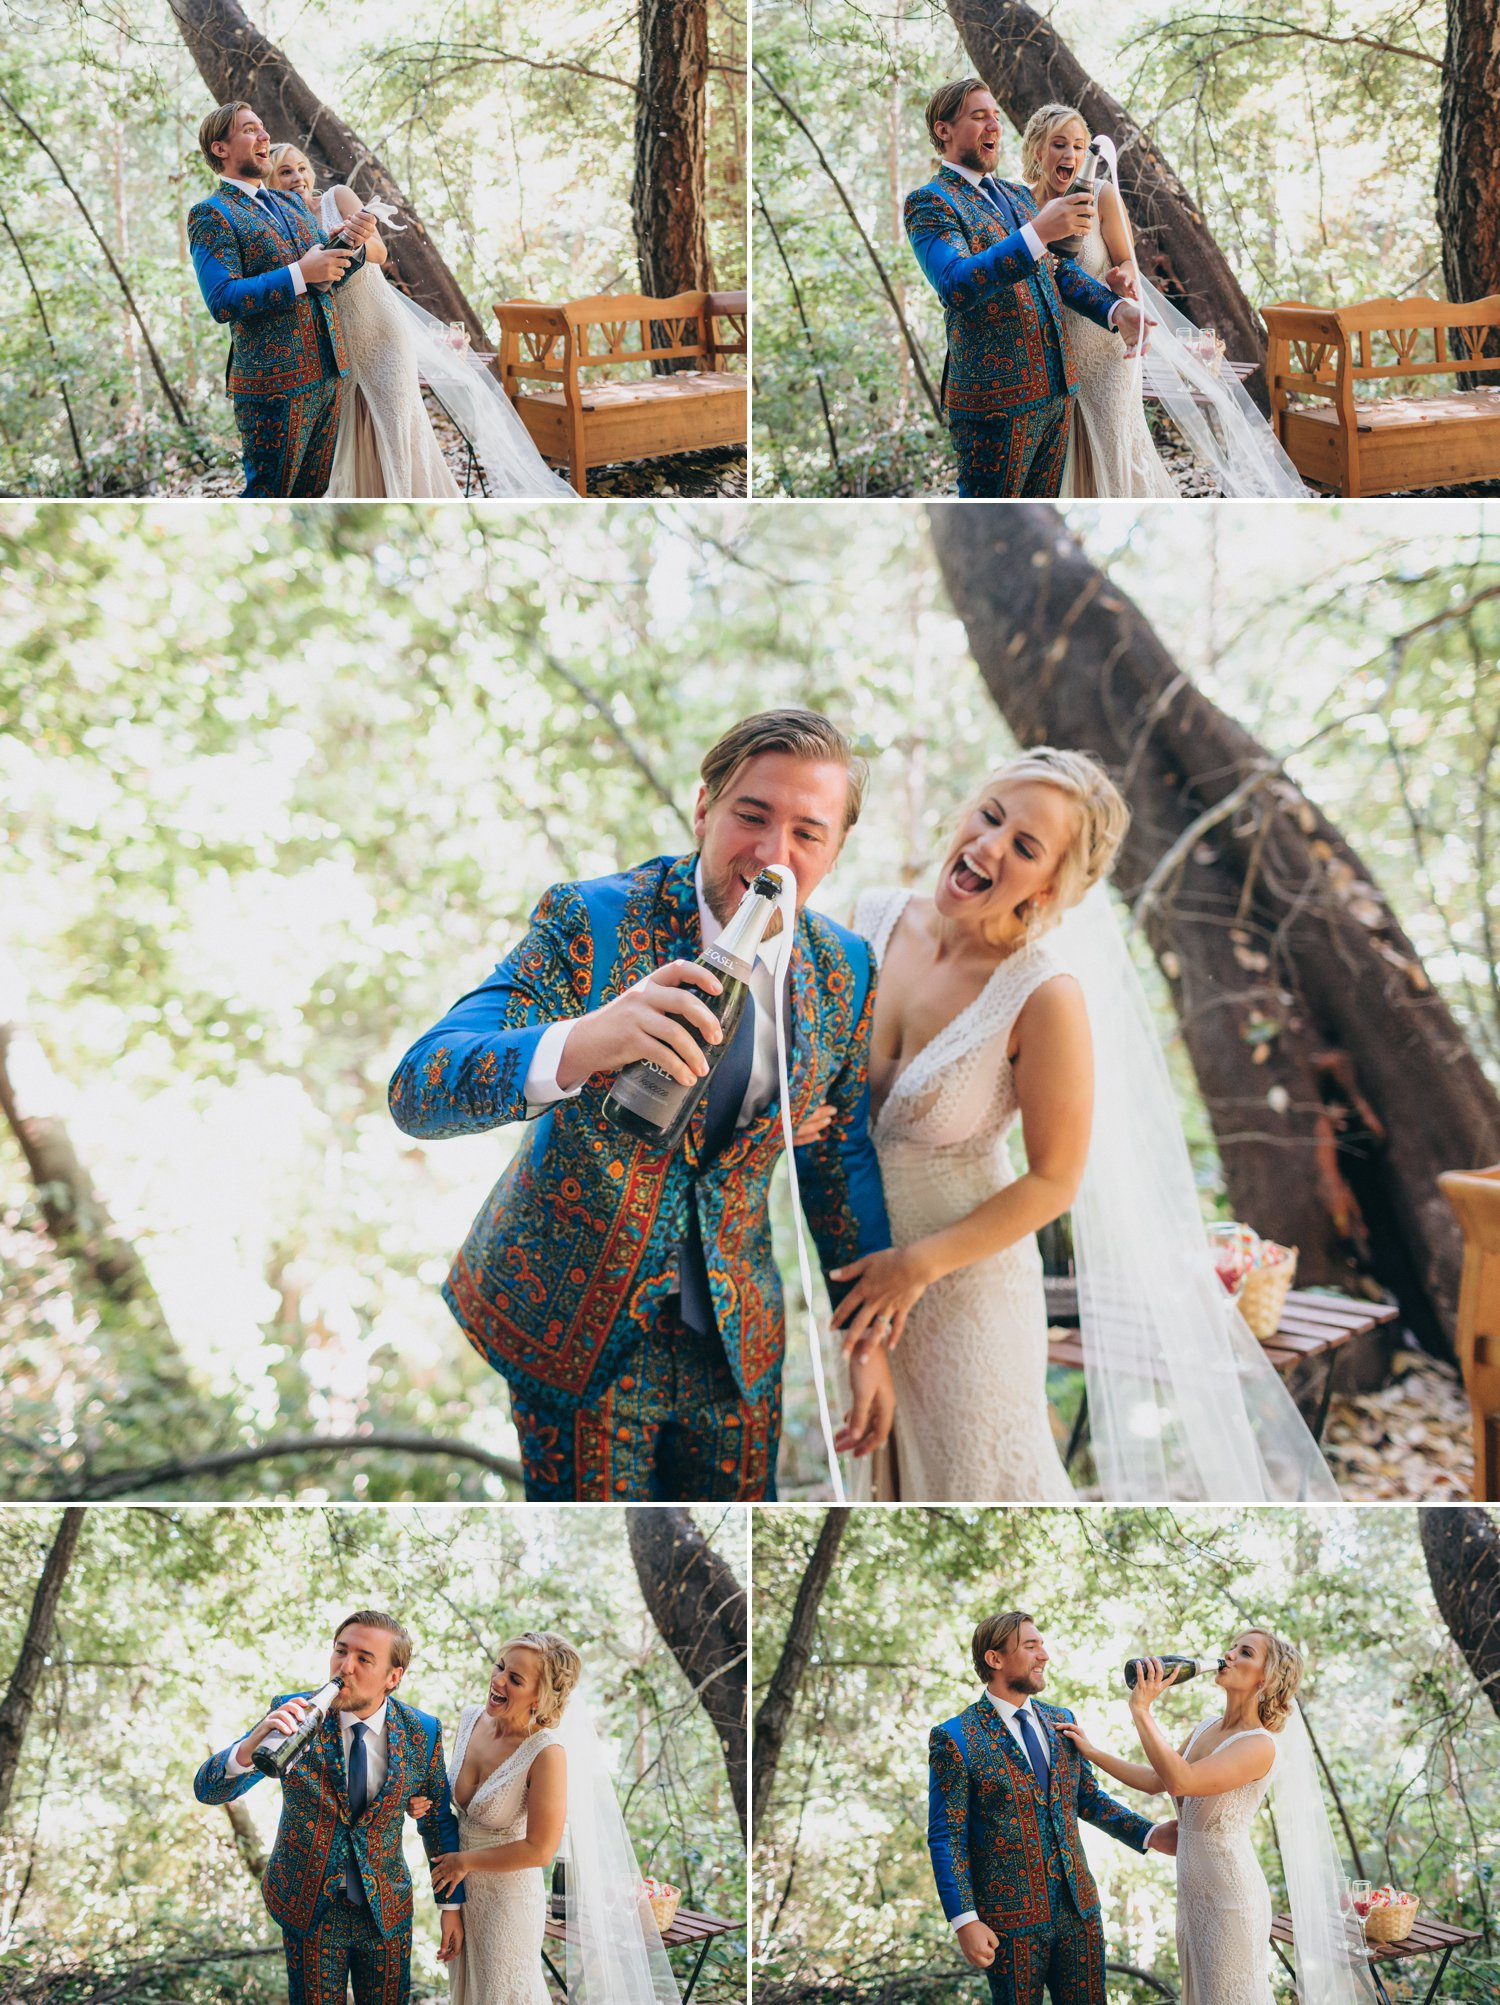 sequoia retreat wedding photography 30.jpg